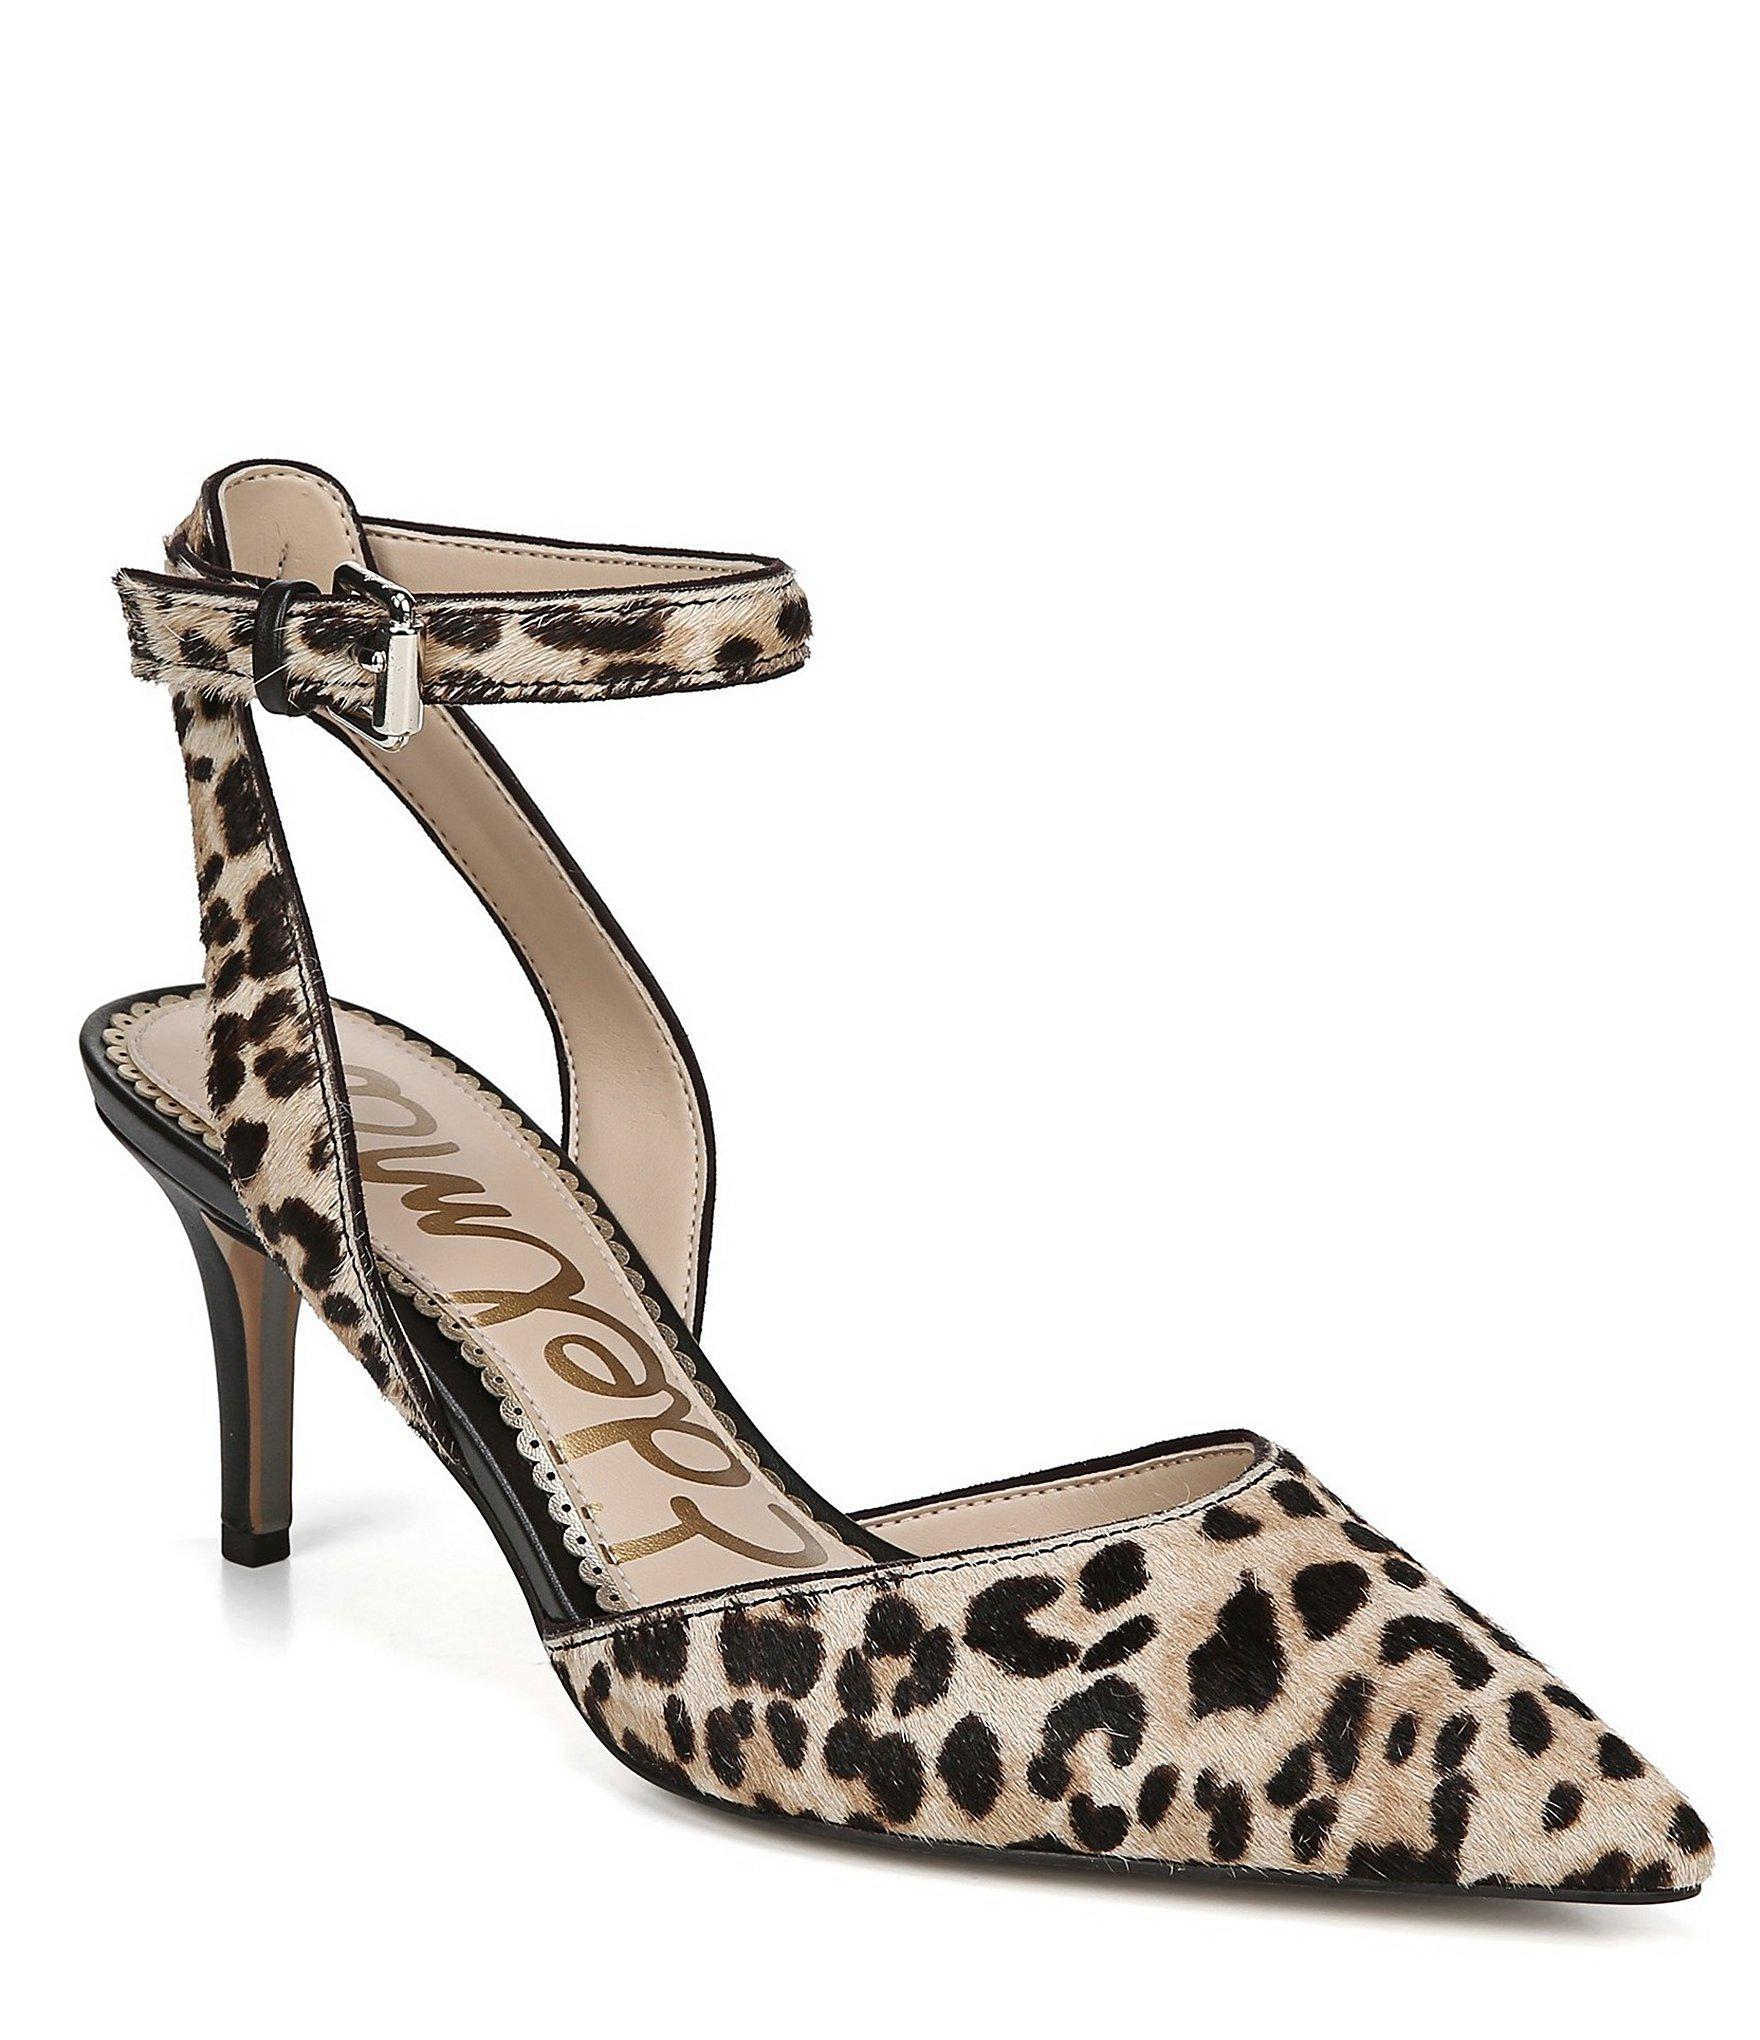 7017f9bfb4a Lyst - Sam Edelman Jelena Leopard Print Calf Hair Dress Pumps